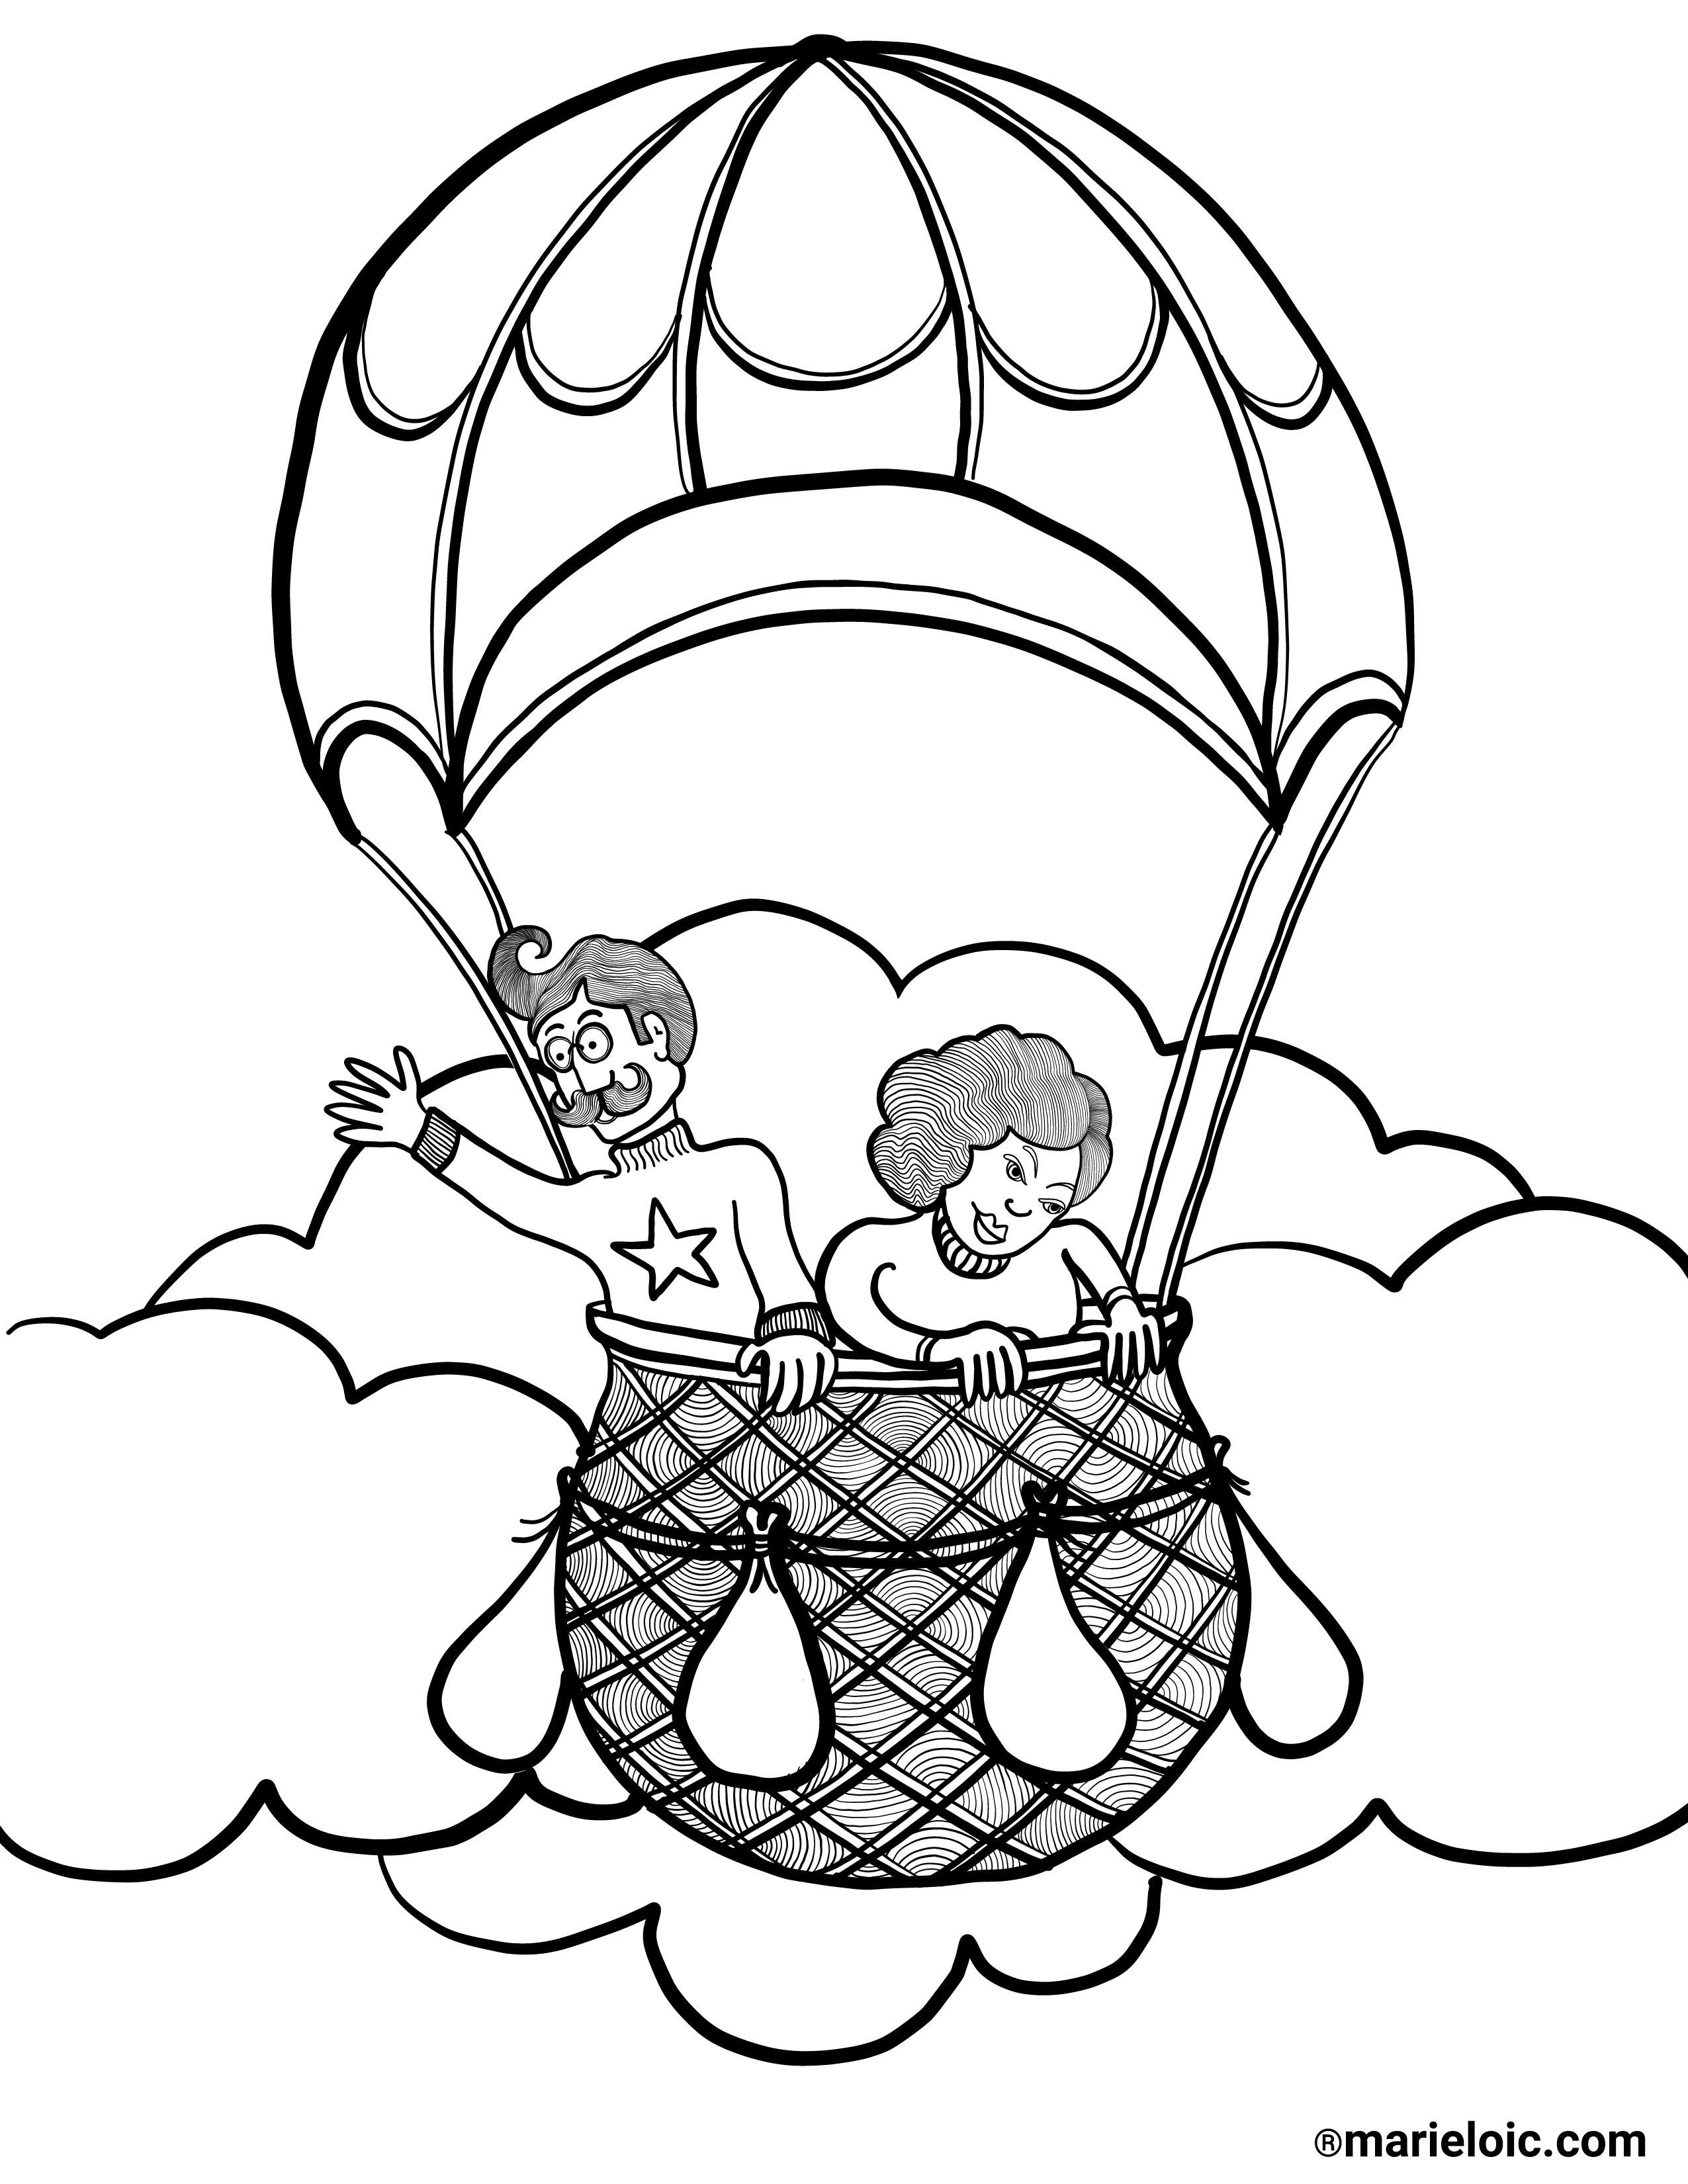 Coloriage Ballon Pdf.Dessin A Colorier Voyages En Ballon Marie Loic Senamaud